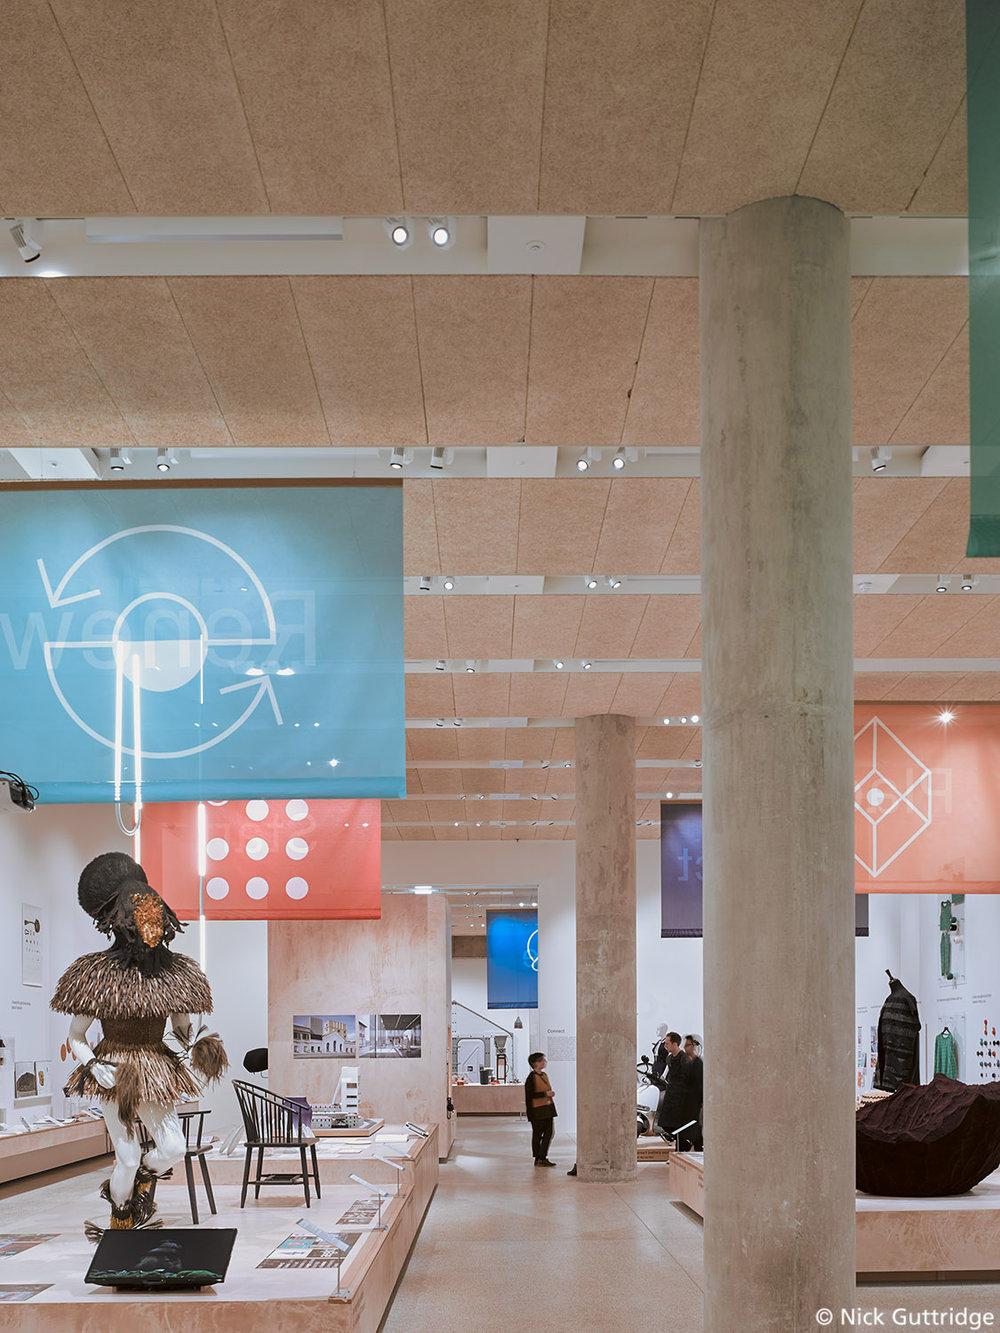 NGUT-1341-DesignMuseum-0033.jpg